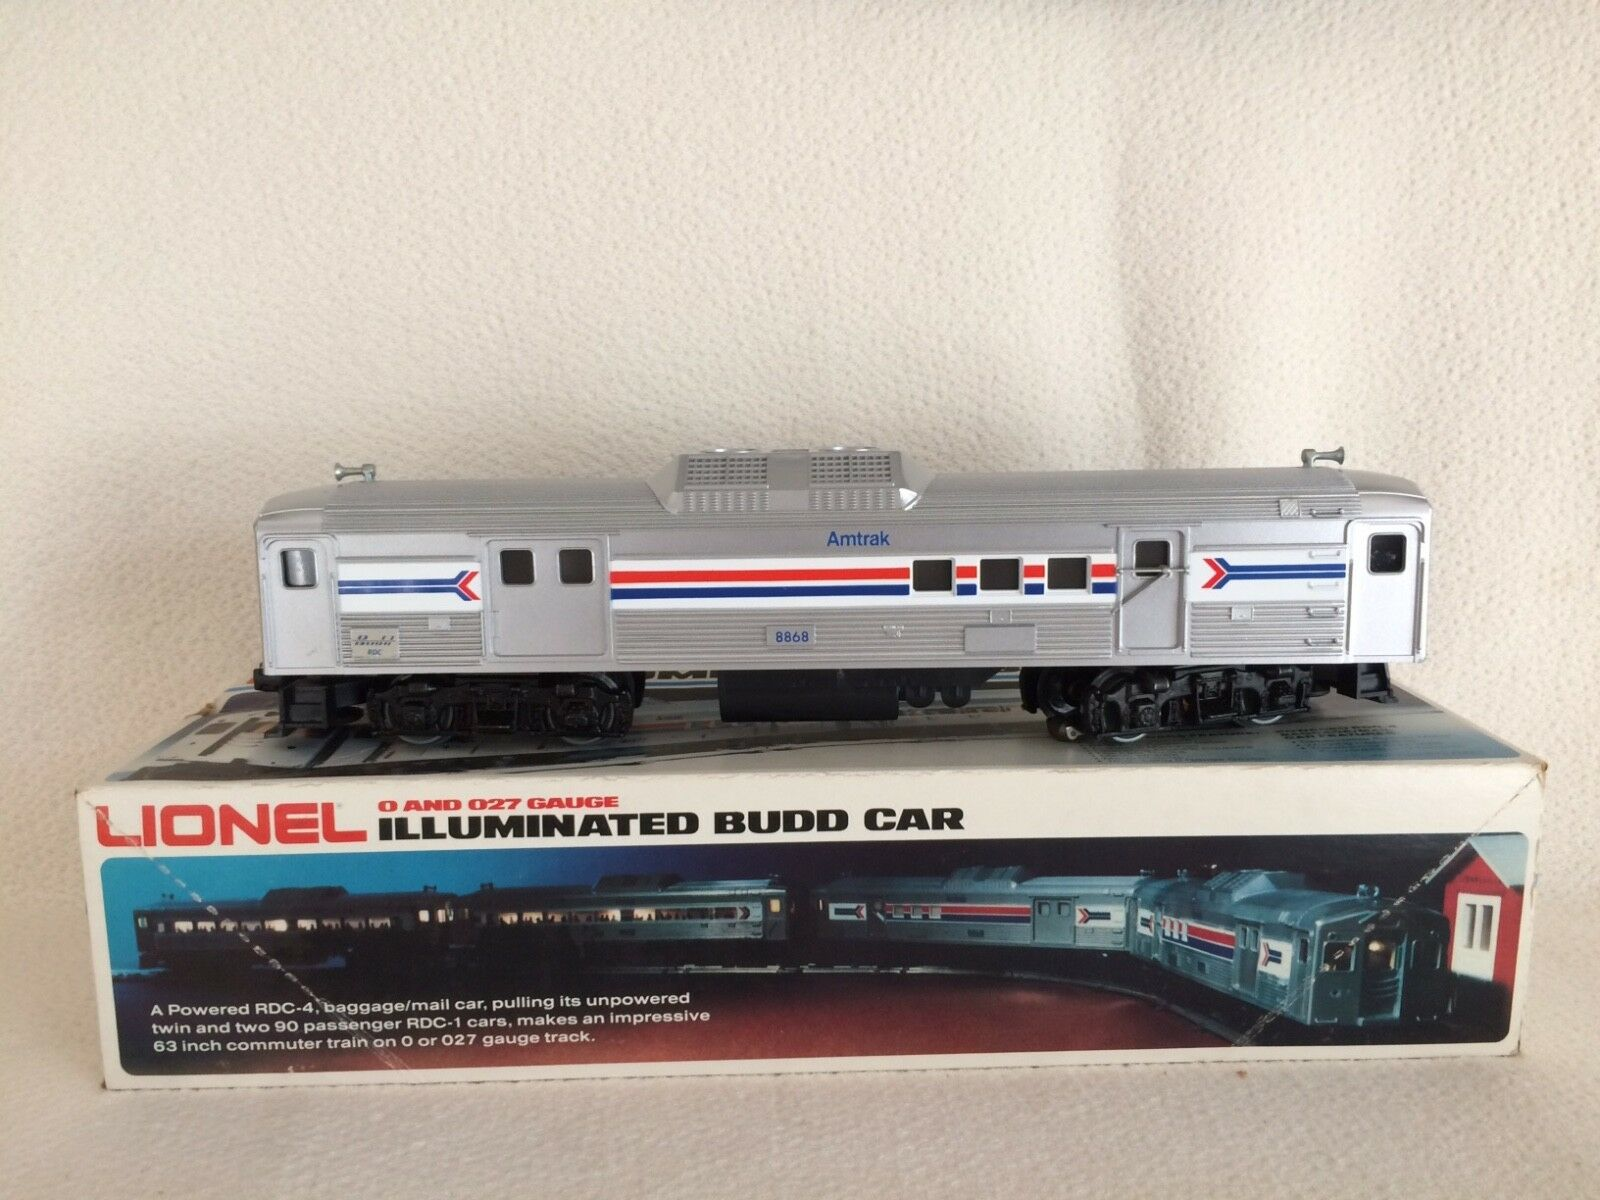 Lionel 1978 Amtrak Illuminated Budd Baggage Mail Car  8868 MINT